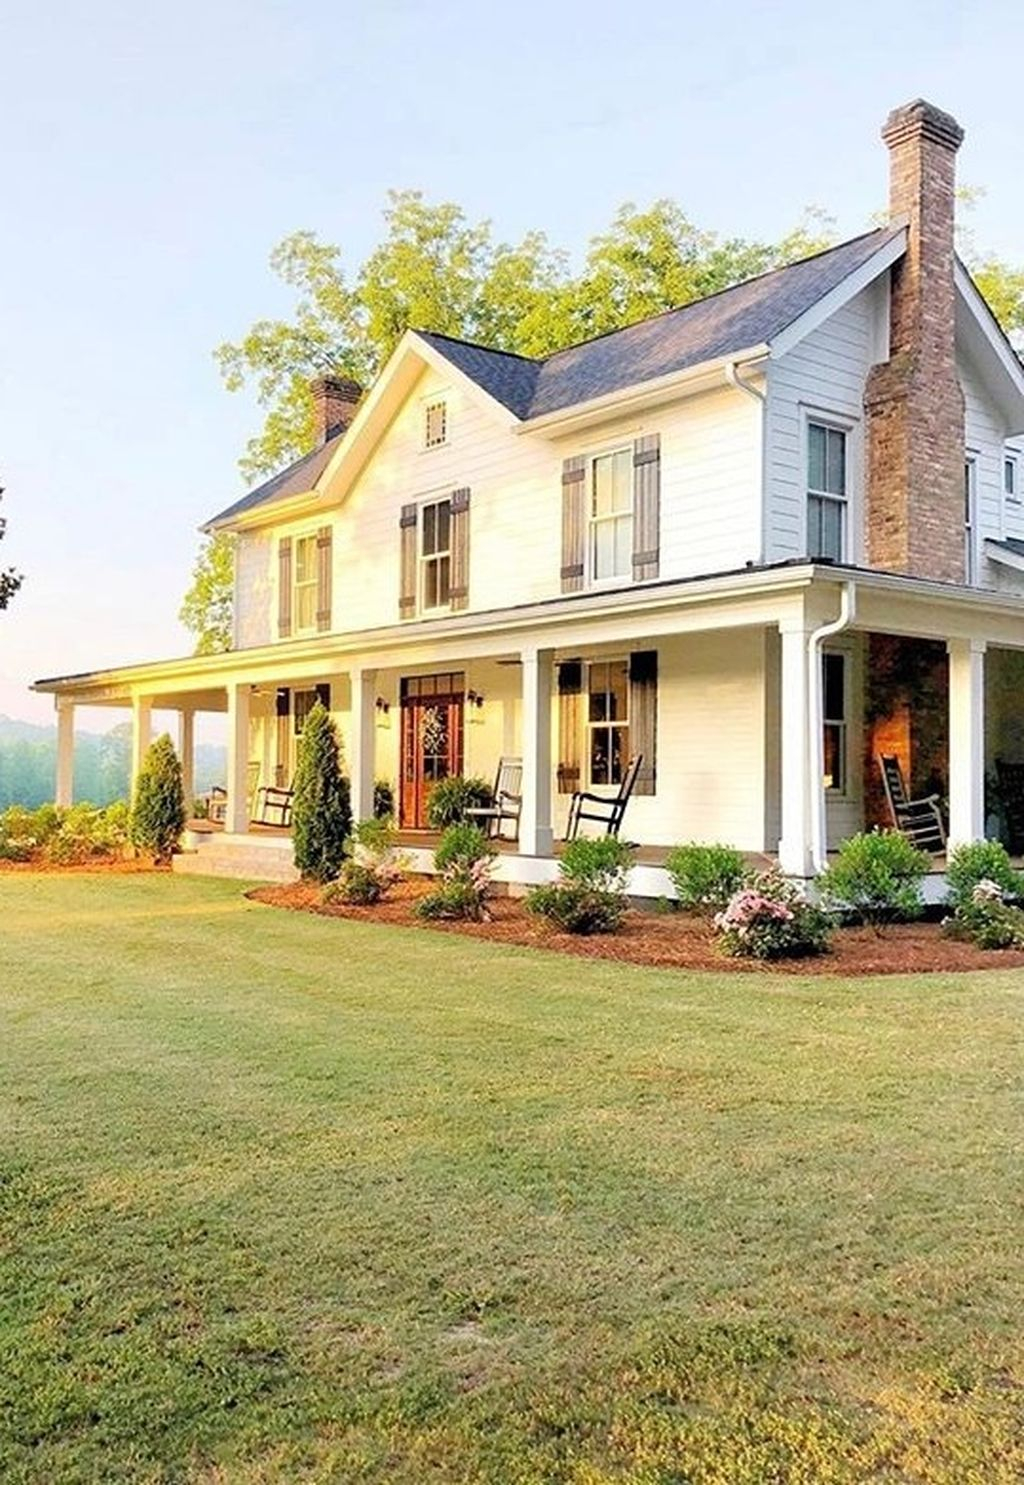 Captivating Farmhouse Exterior House Design Ideas To Copy Right Now 12